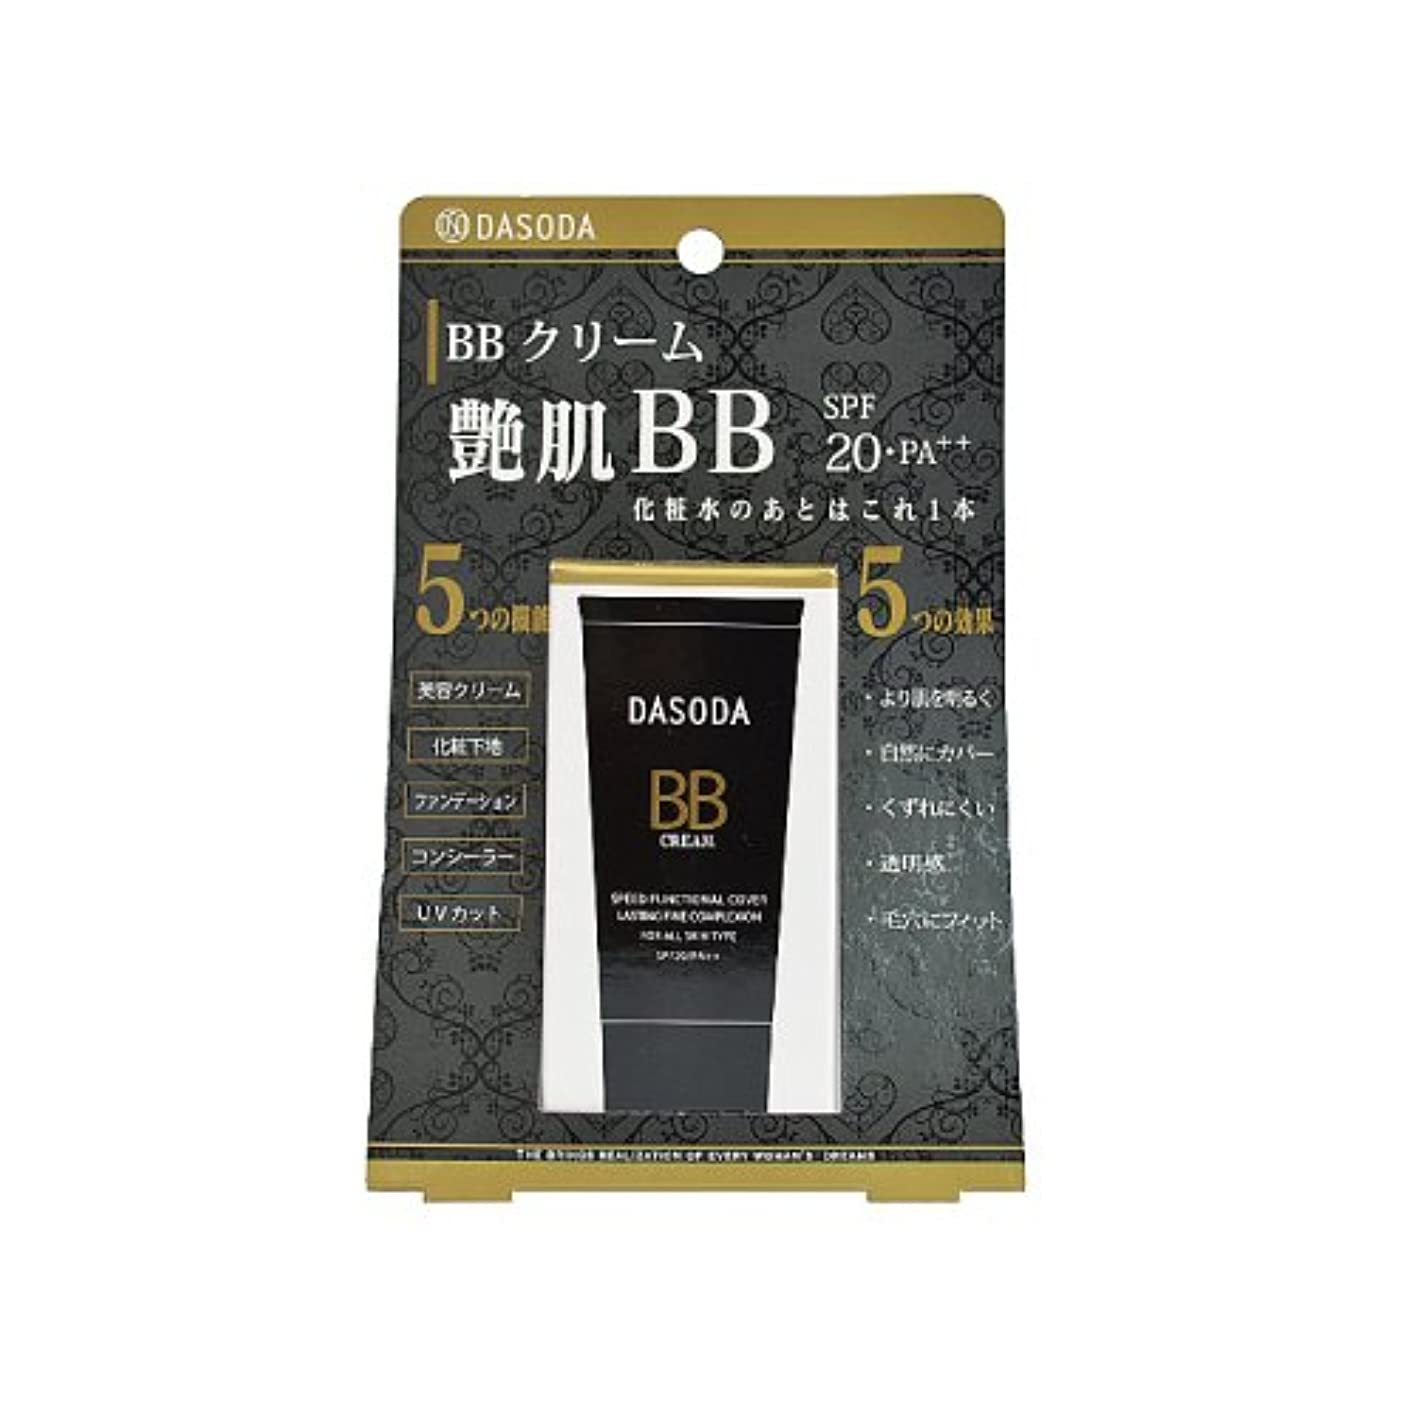 DASODA(ダソダ) FC BB クリーム